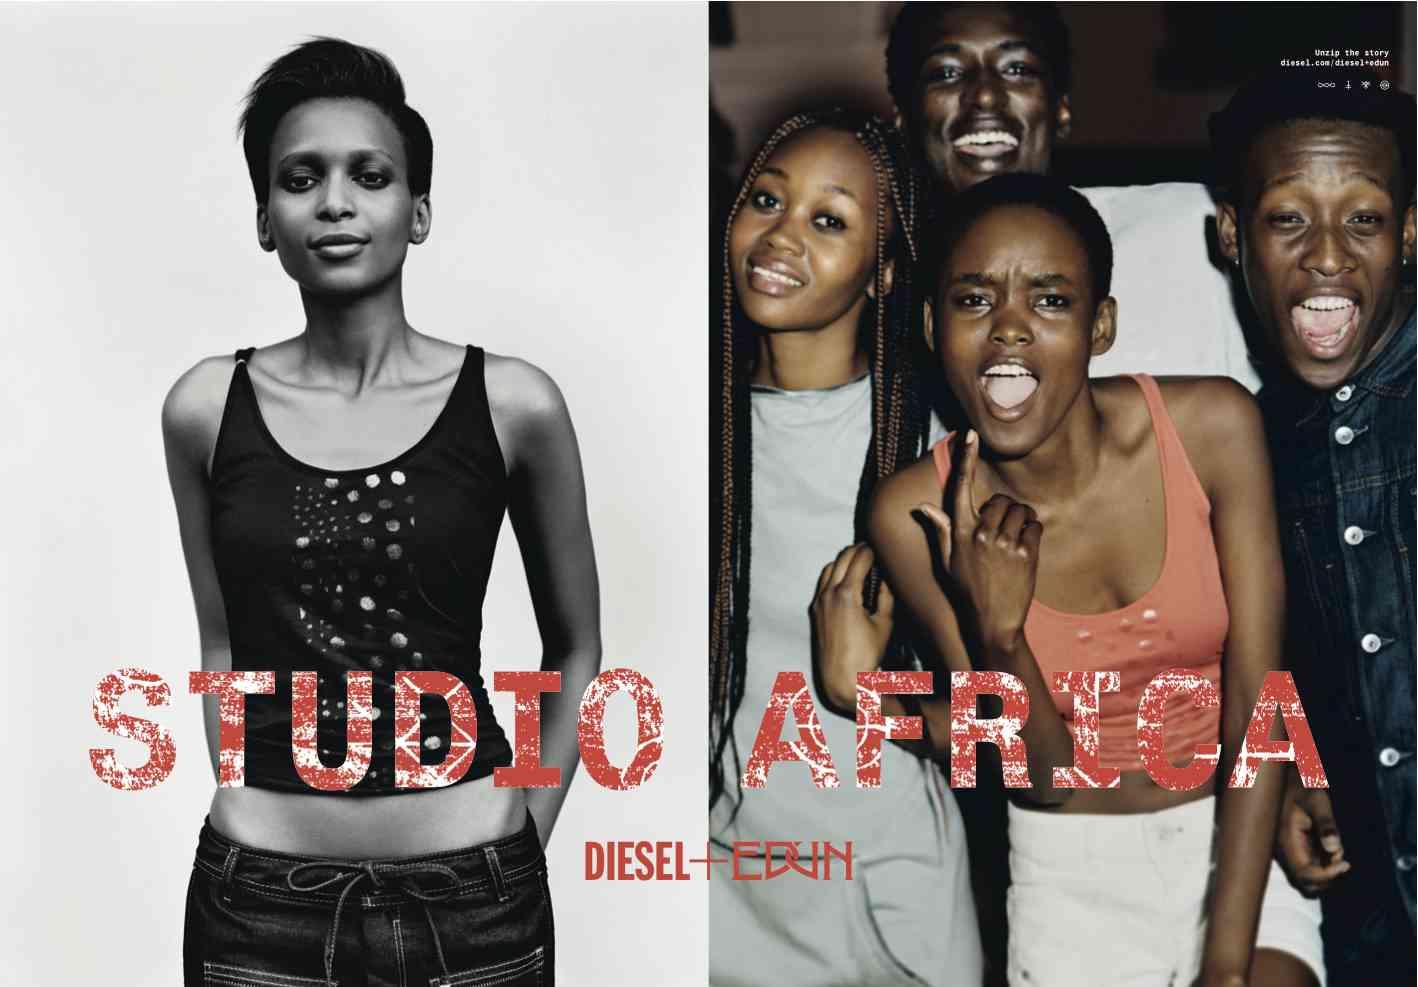 Diesel + Edun SS13 Studio Africa shot by Alasdair Mclellan